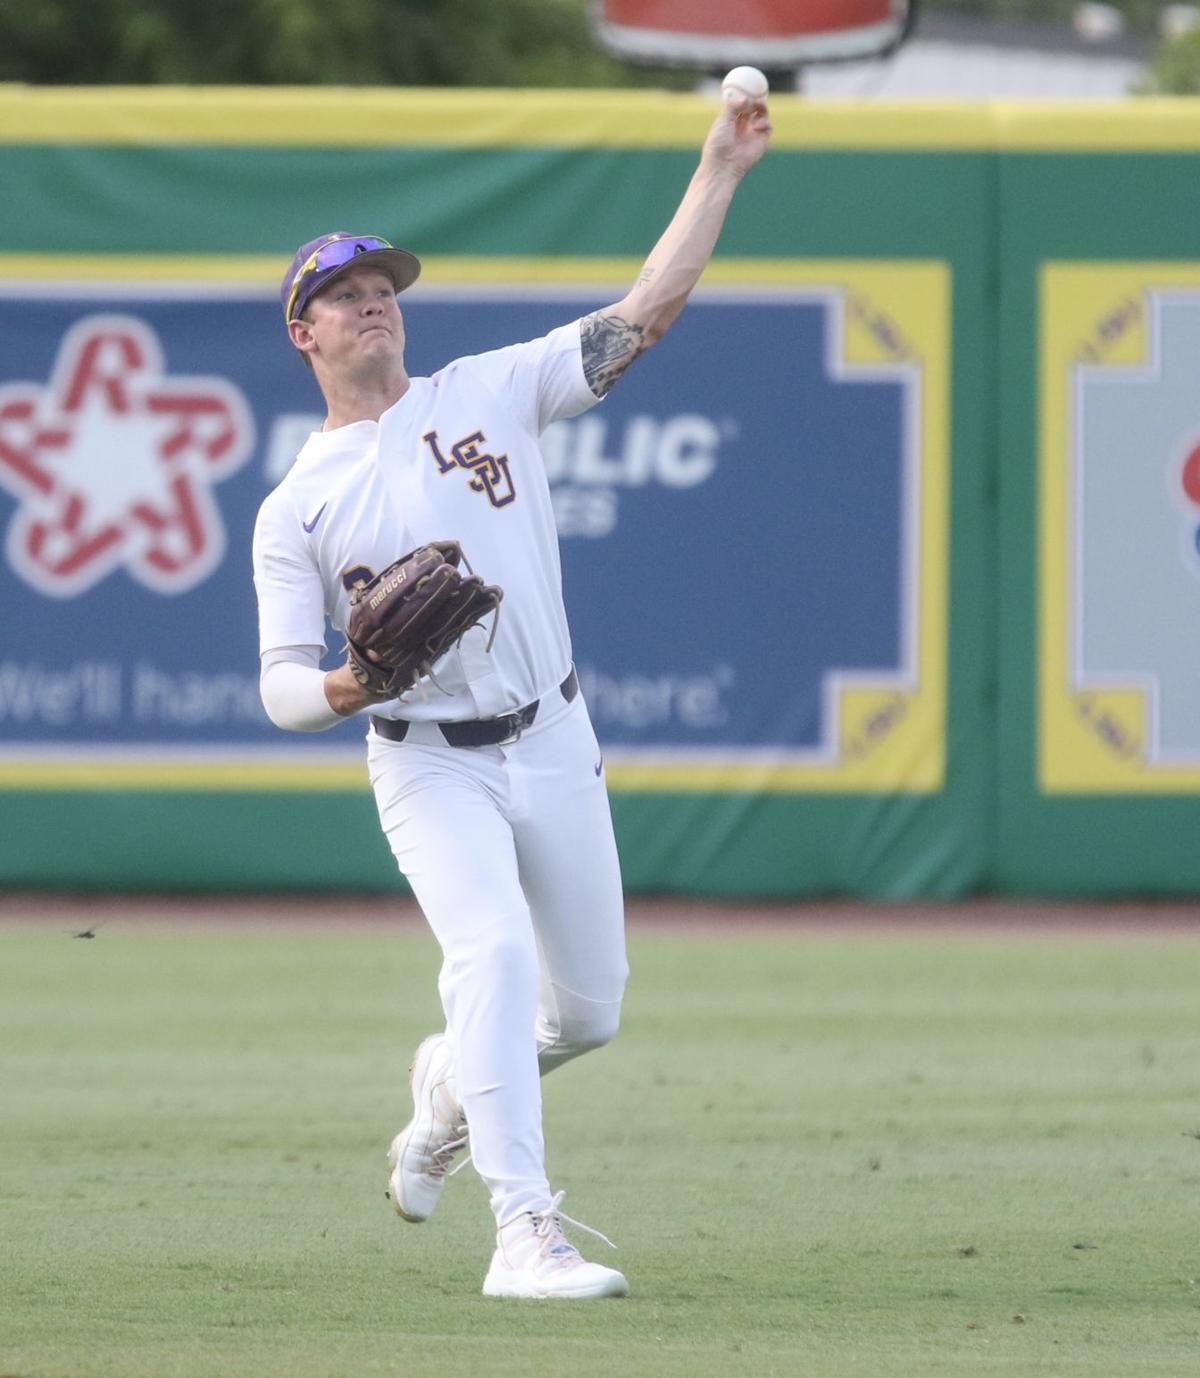 LSU baseball in NCAA Regional: Daniel Cabrera